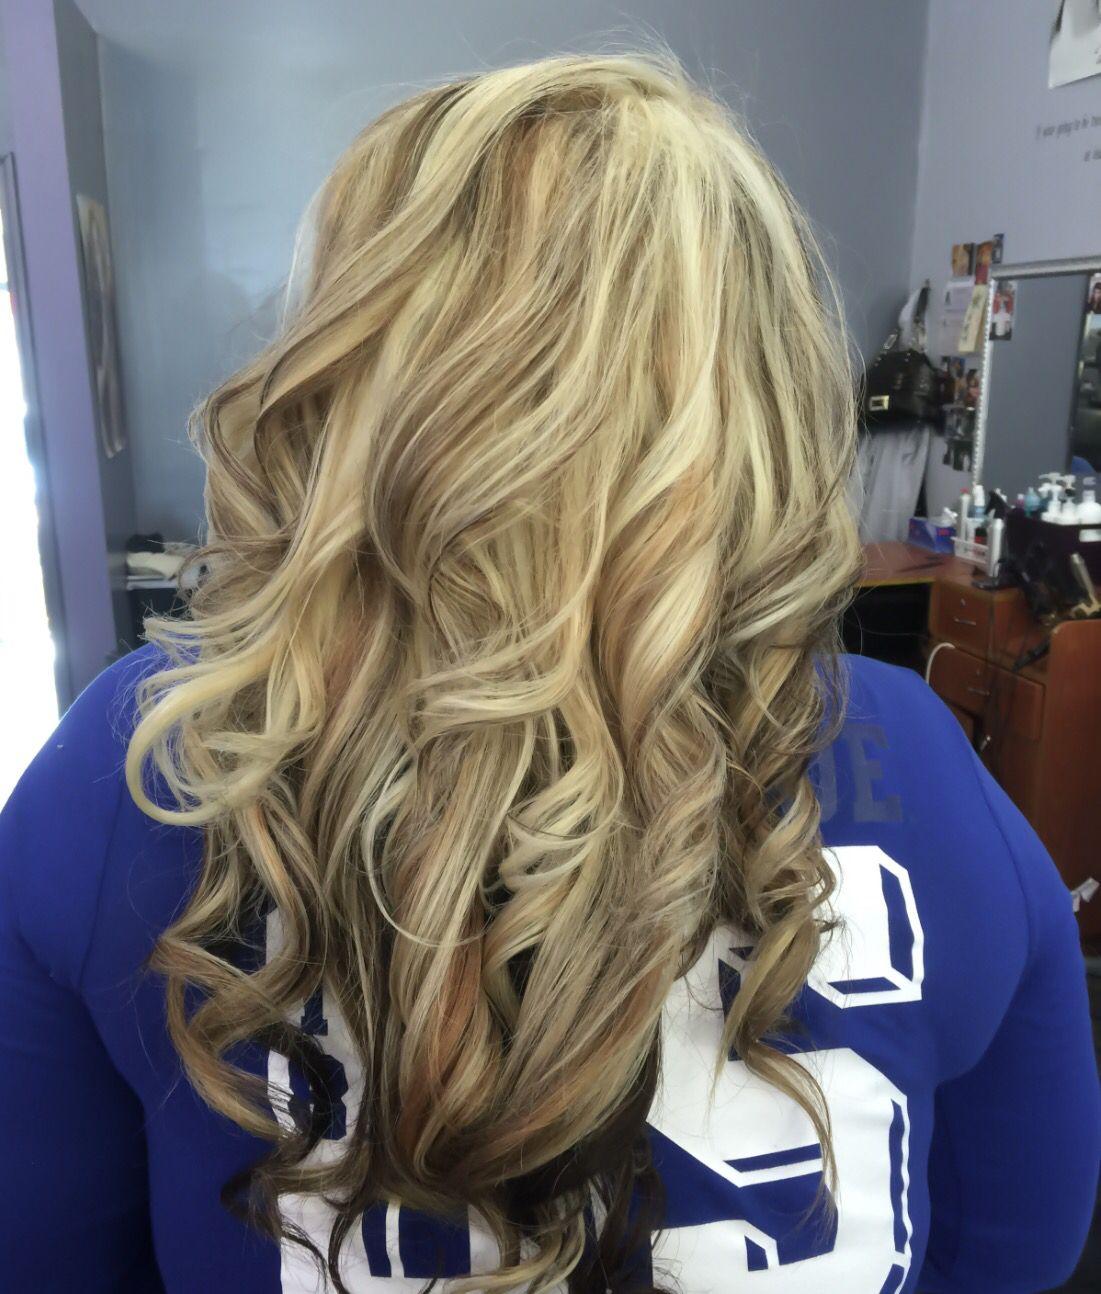 Light caramel blonde hair color